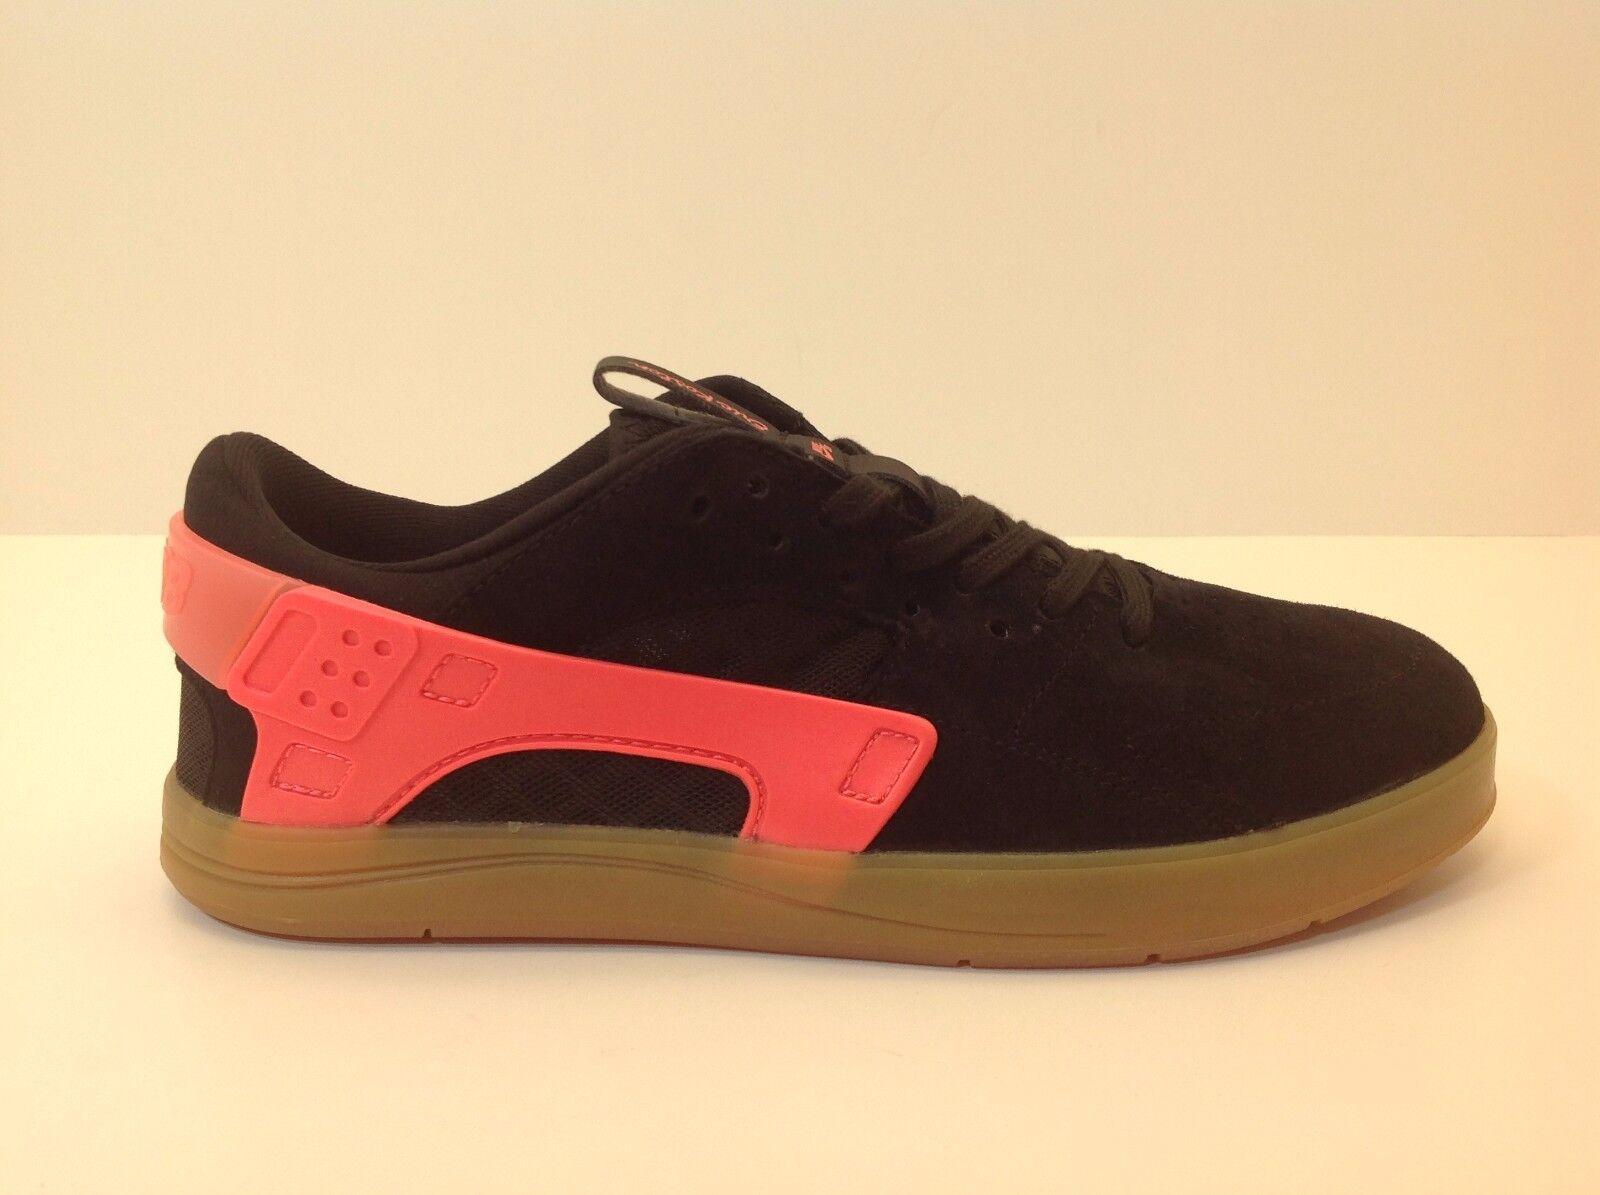 Nike Eric Koston Huarache Men's Sizes 8-12 New in Box Black 705192 062